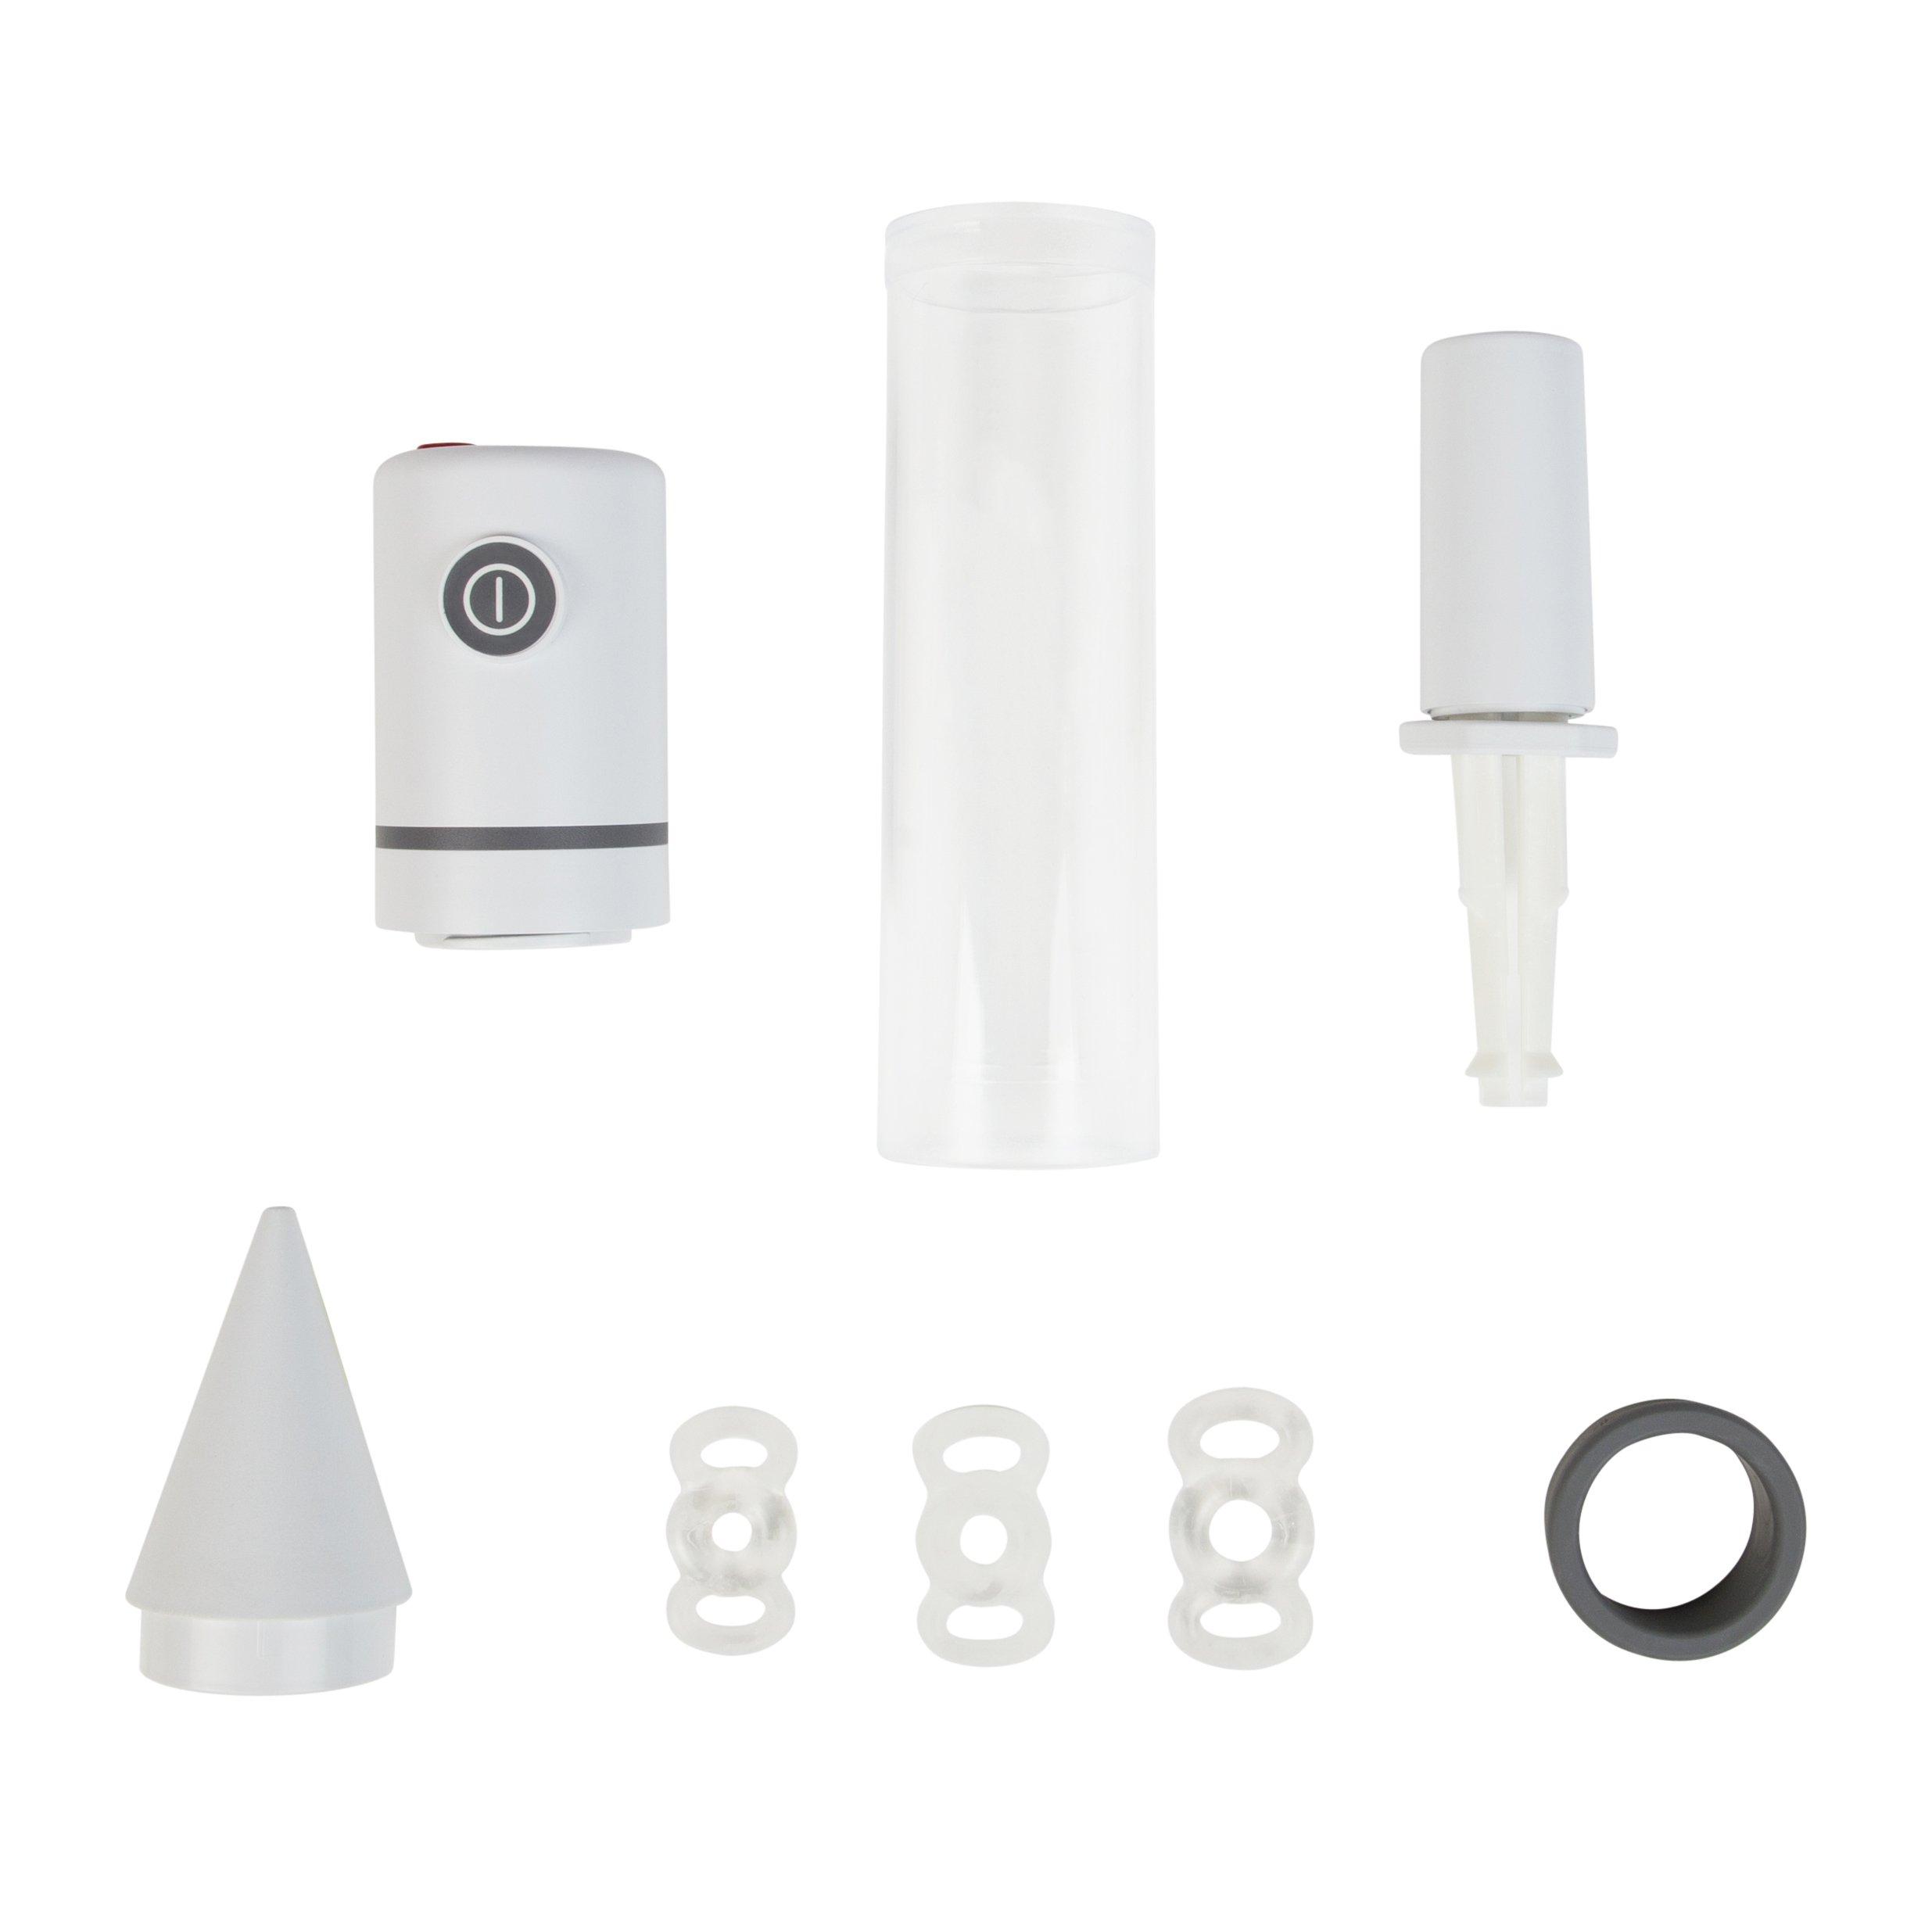 Vacuum Pump for Men, Natural Alternative to Erectile Dysfunction Pills, Automatic Penis Pump, Men's Pump Head for Erectile Dysfunction - Pos-T-Vac ErecTech B2000 Pump Head by POS-T-VAC (Image #2)